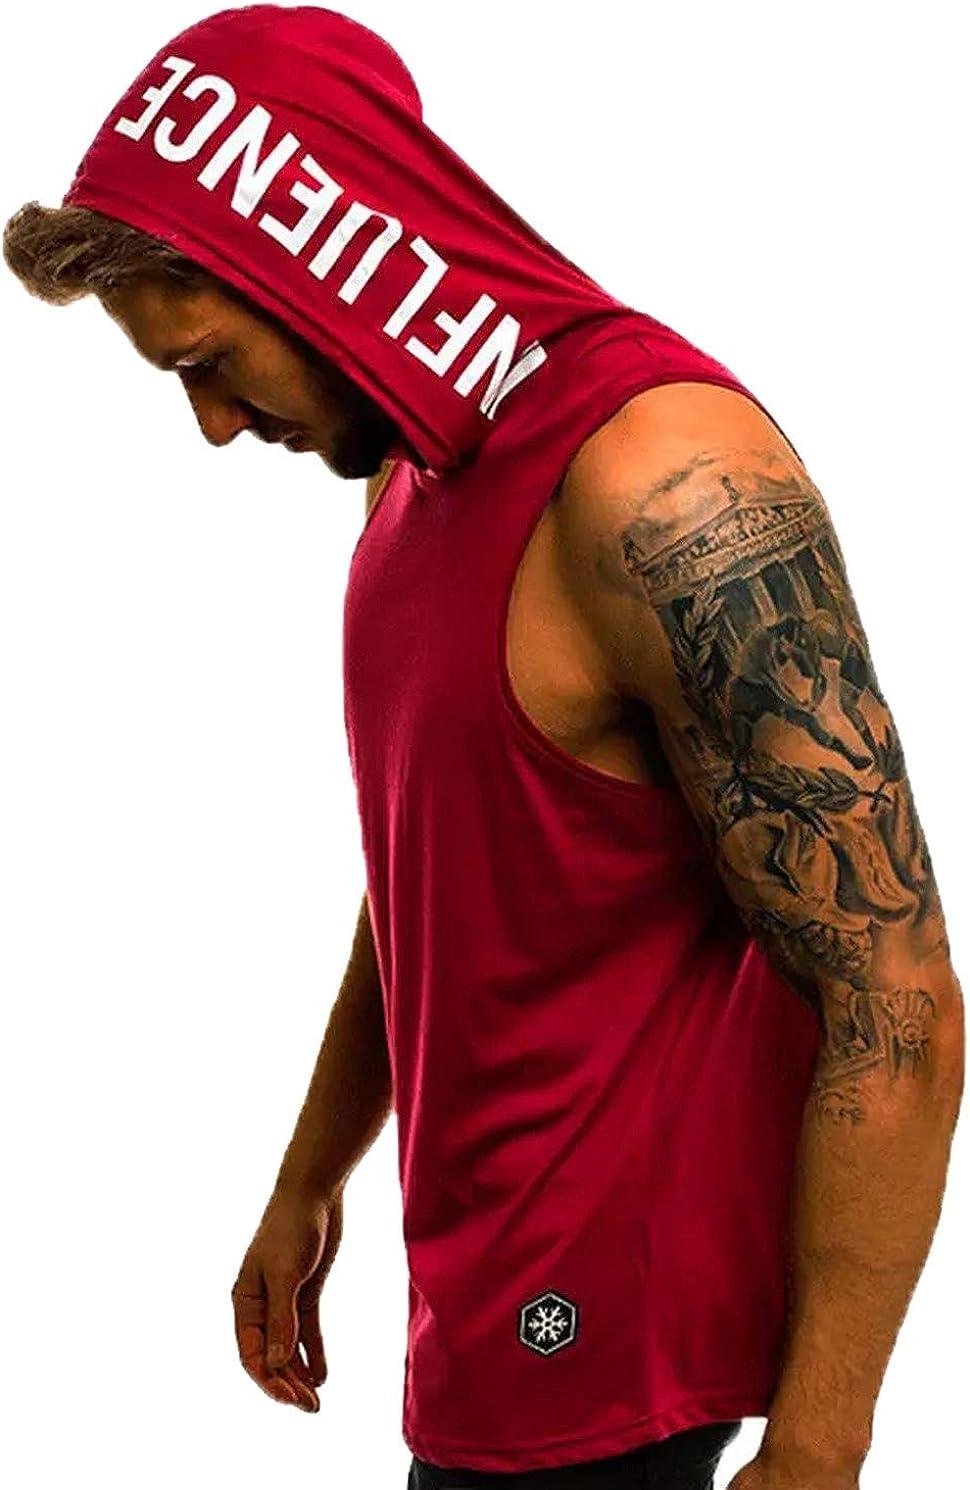 Camiseta sin Mangas y Capucha para Entrenar. Camisa Fitness ...